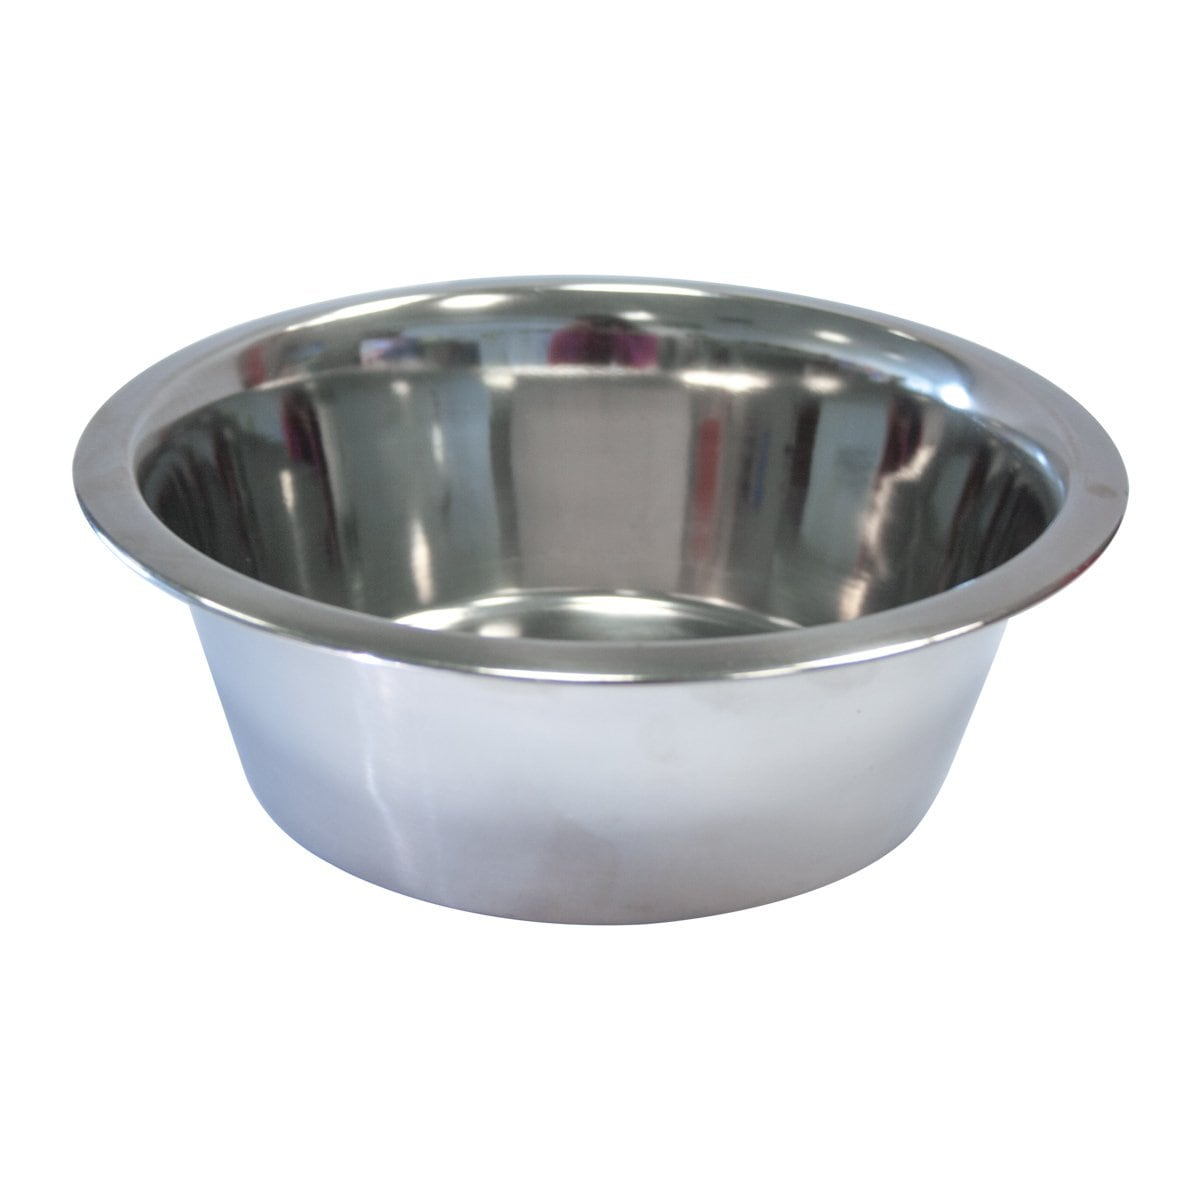 Plato de Acero Base Antiderrapante 32 Oz Fancy Pets Mod. Fl8164